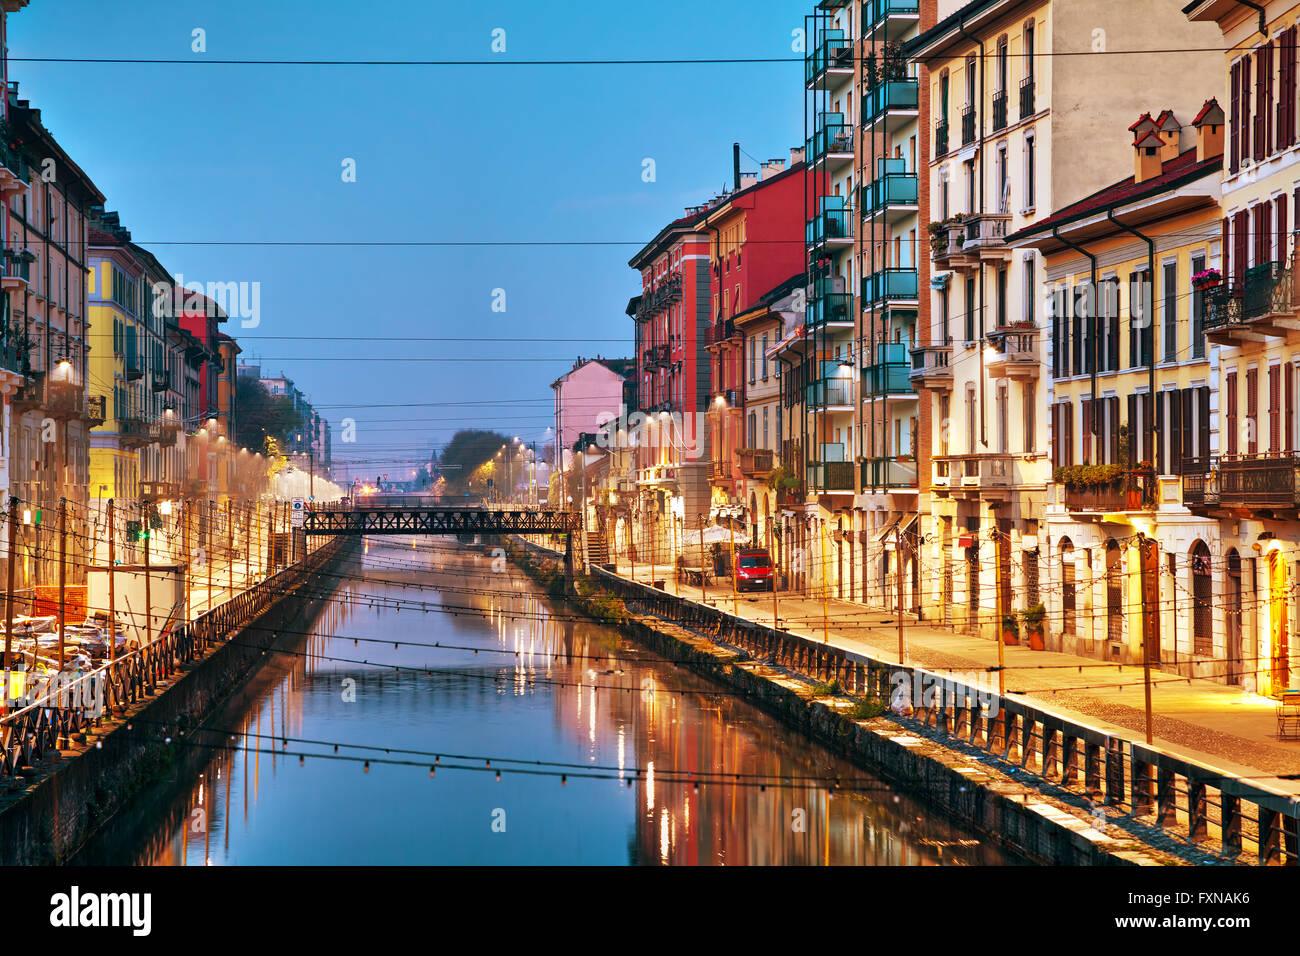 Le canal Naviglio Grande à Milan, Italie au lever du soleil Photo Stock